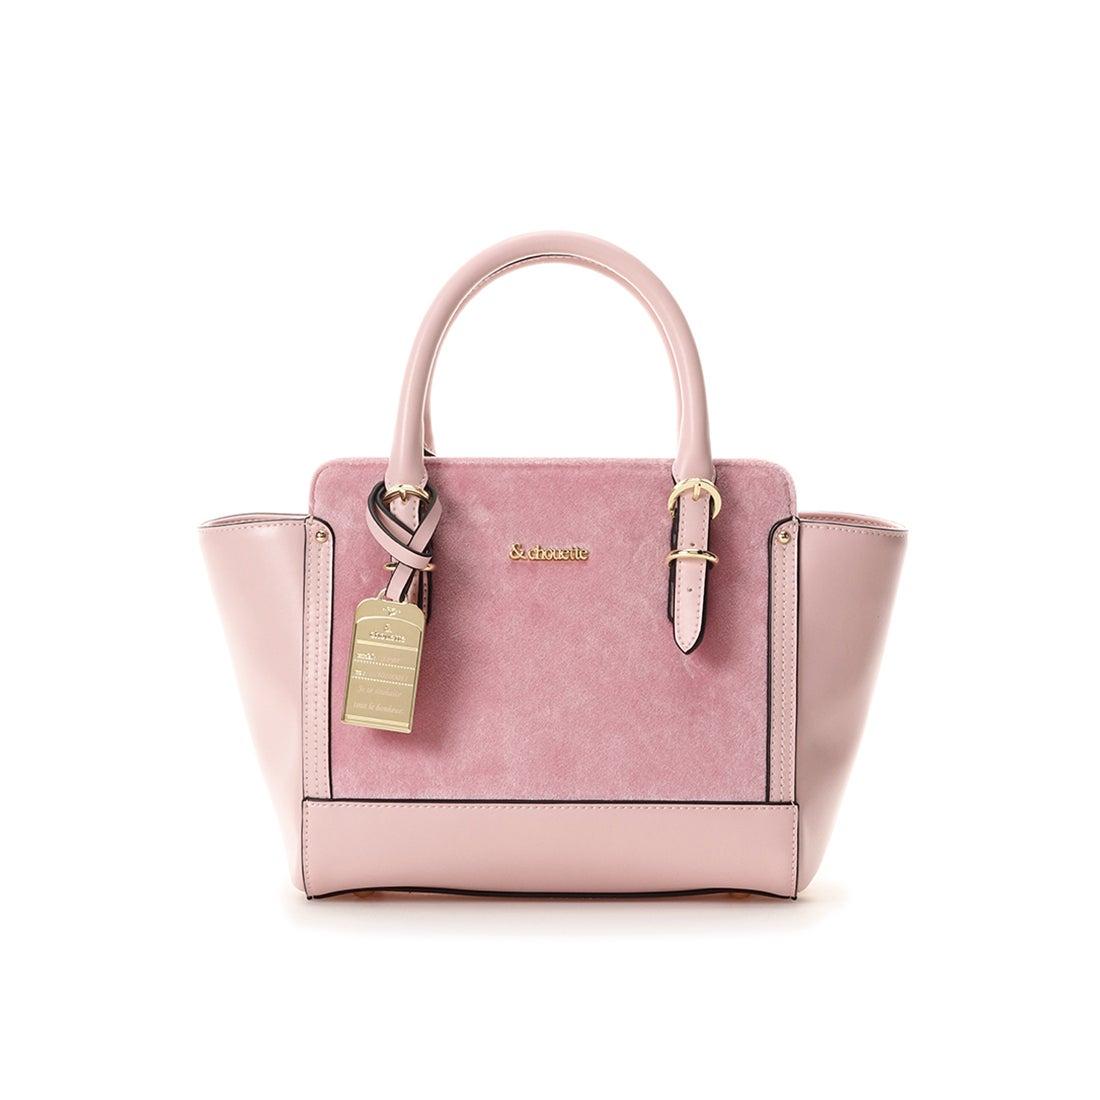 4fef950074aa & chouette &シュエット べロアハンドバッグ(S) ピンク -靴&ファッション通販 ロコンド〜自宅で試着、気軽に返品